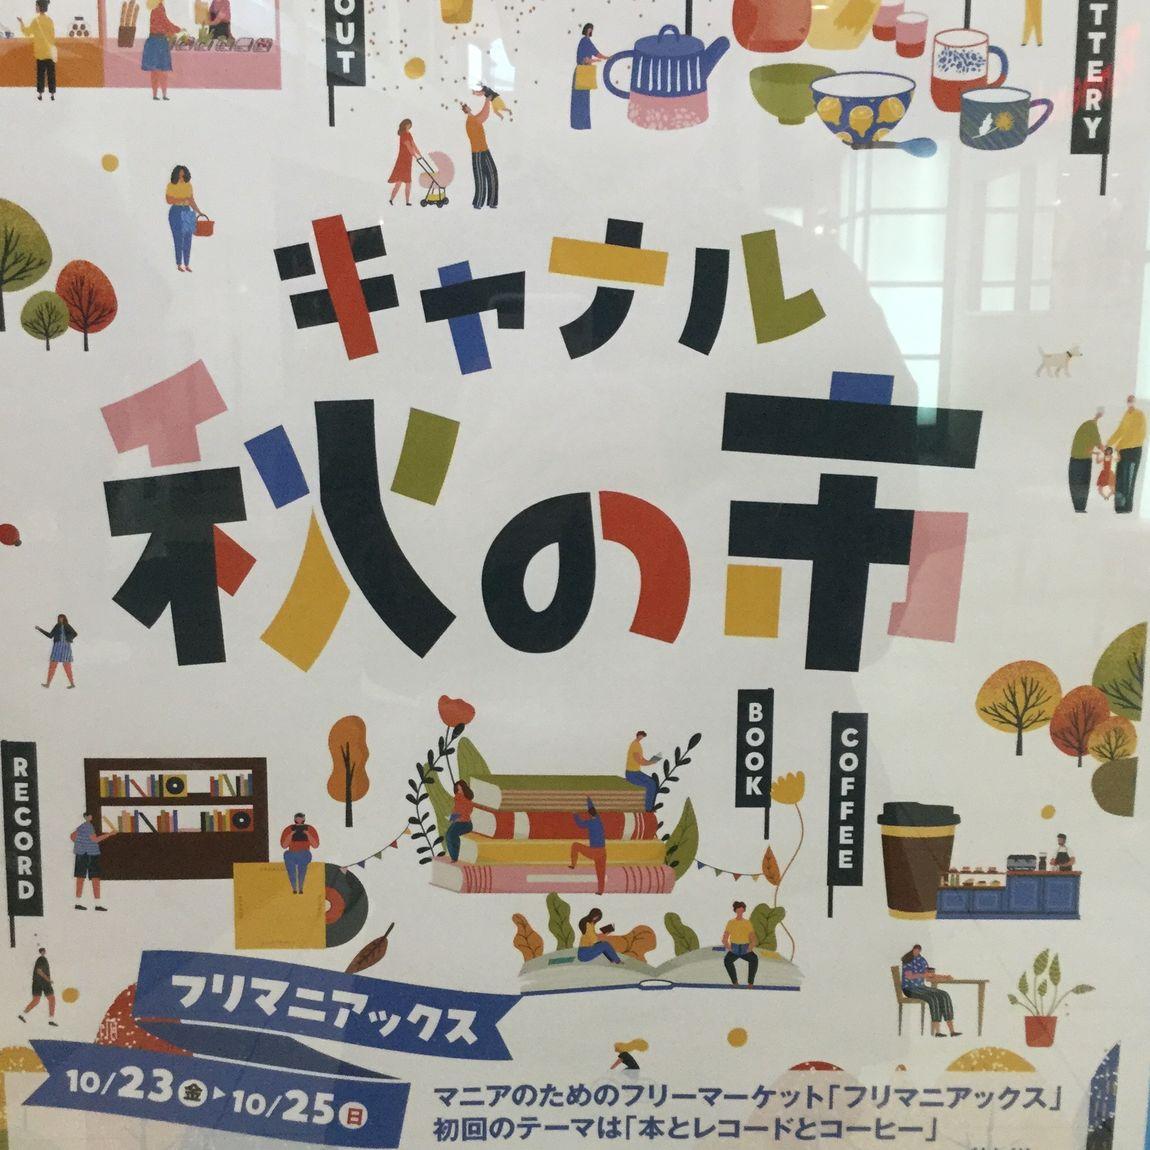 【MUJIキャナルシティ博多】フリマニアックス開催中